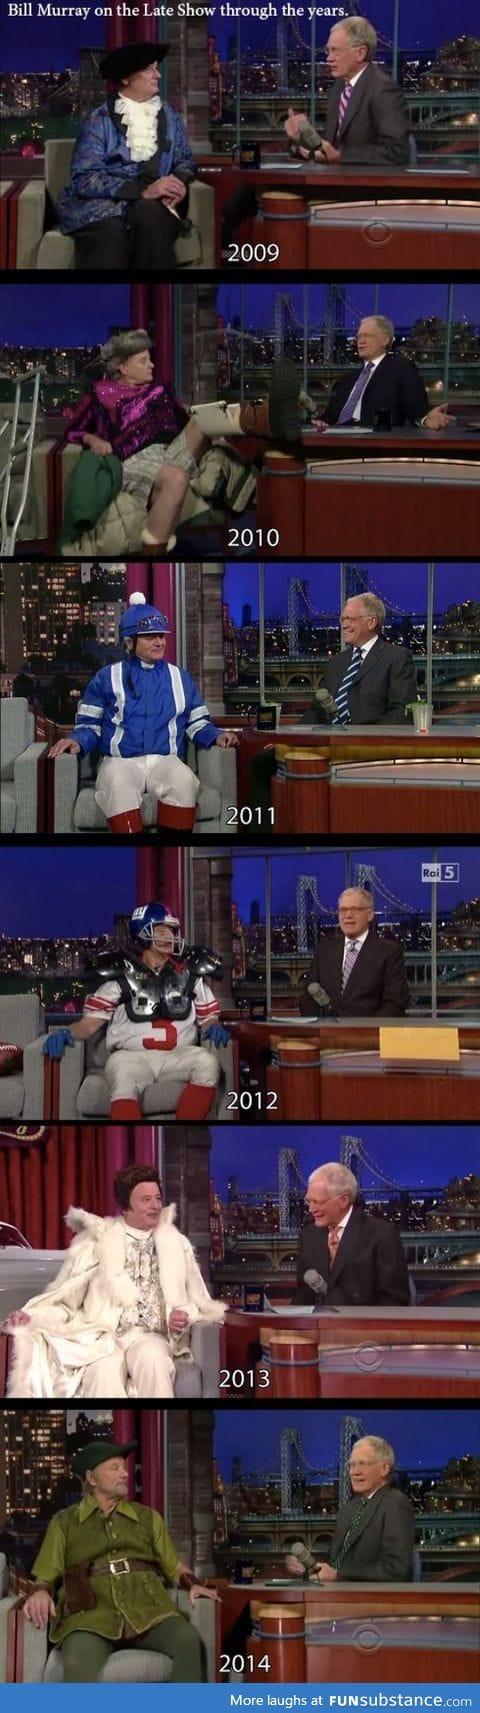 Bill Murray on Letterman 2009-2014